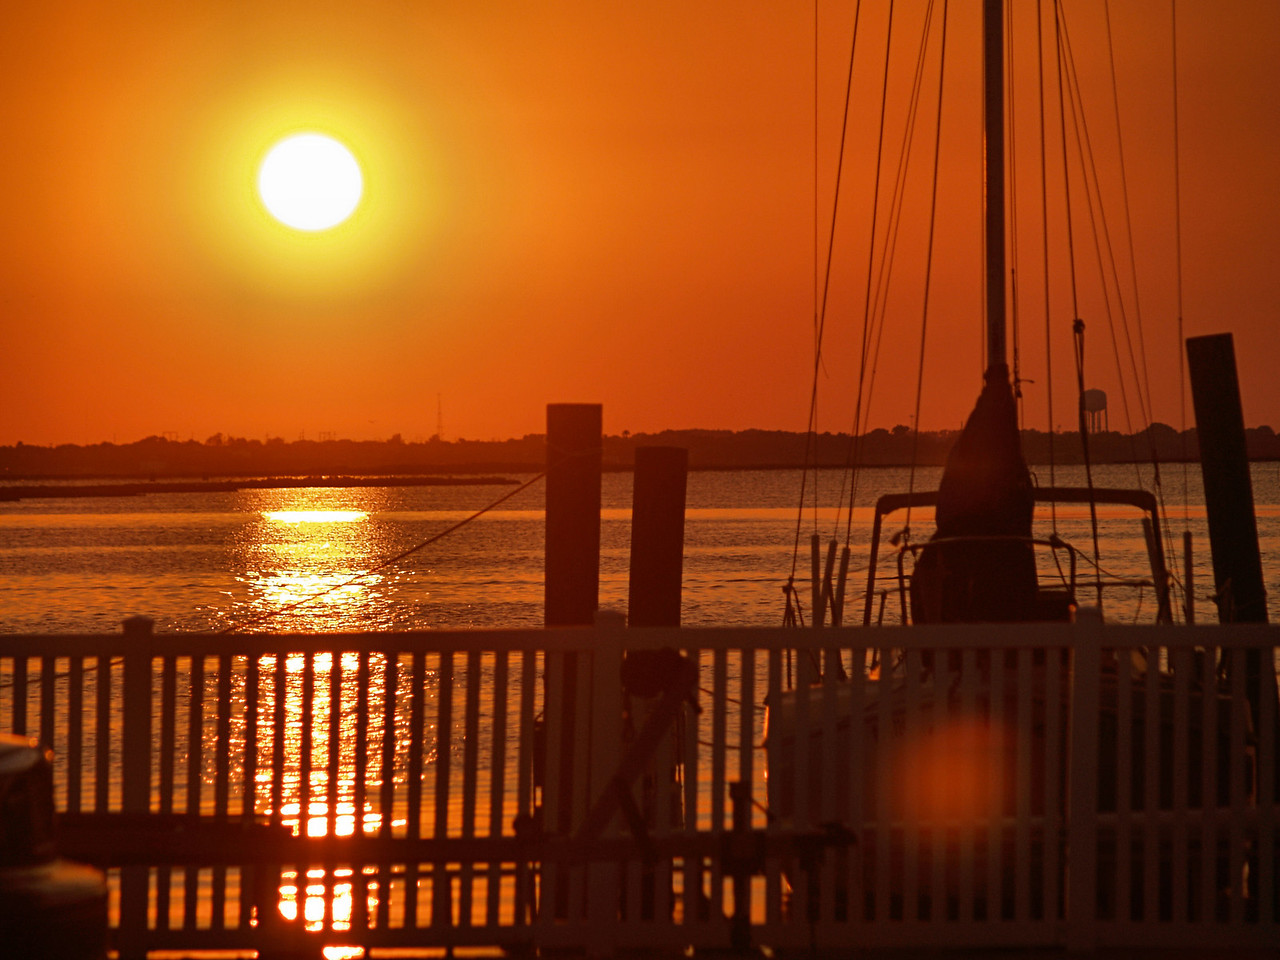 OLYMPUS DIGITAL CAMERA--The sun sets over Laguna Madre.